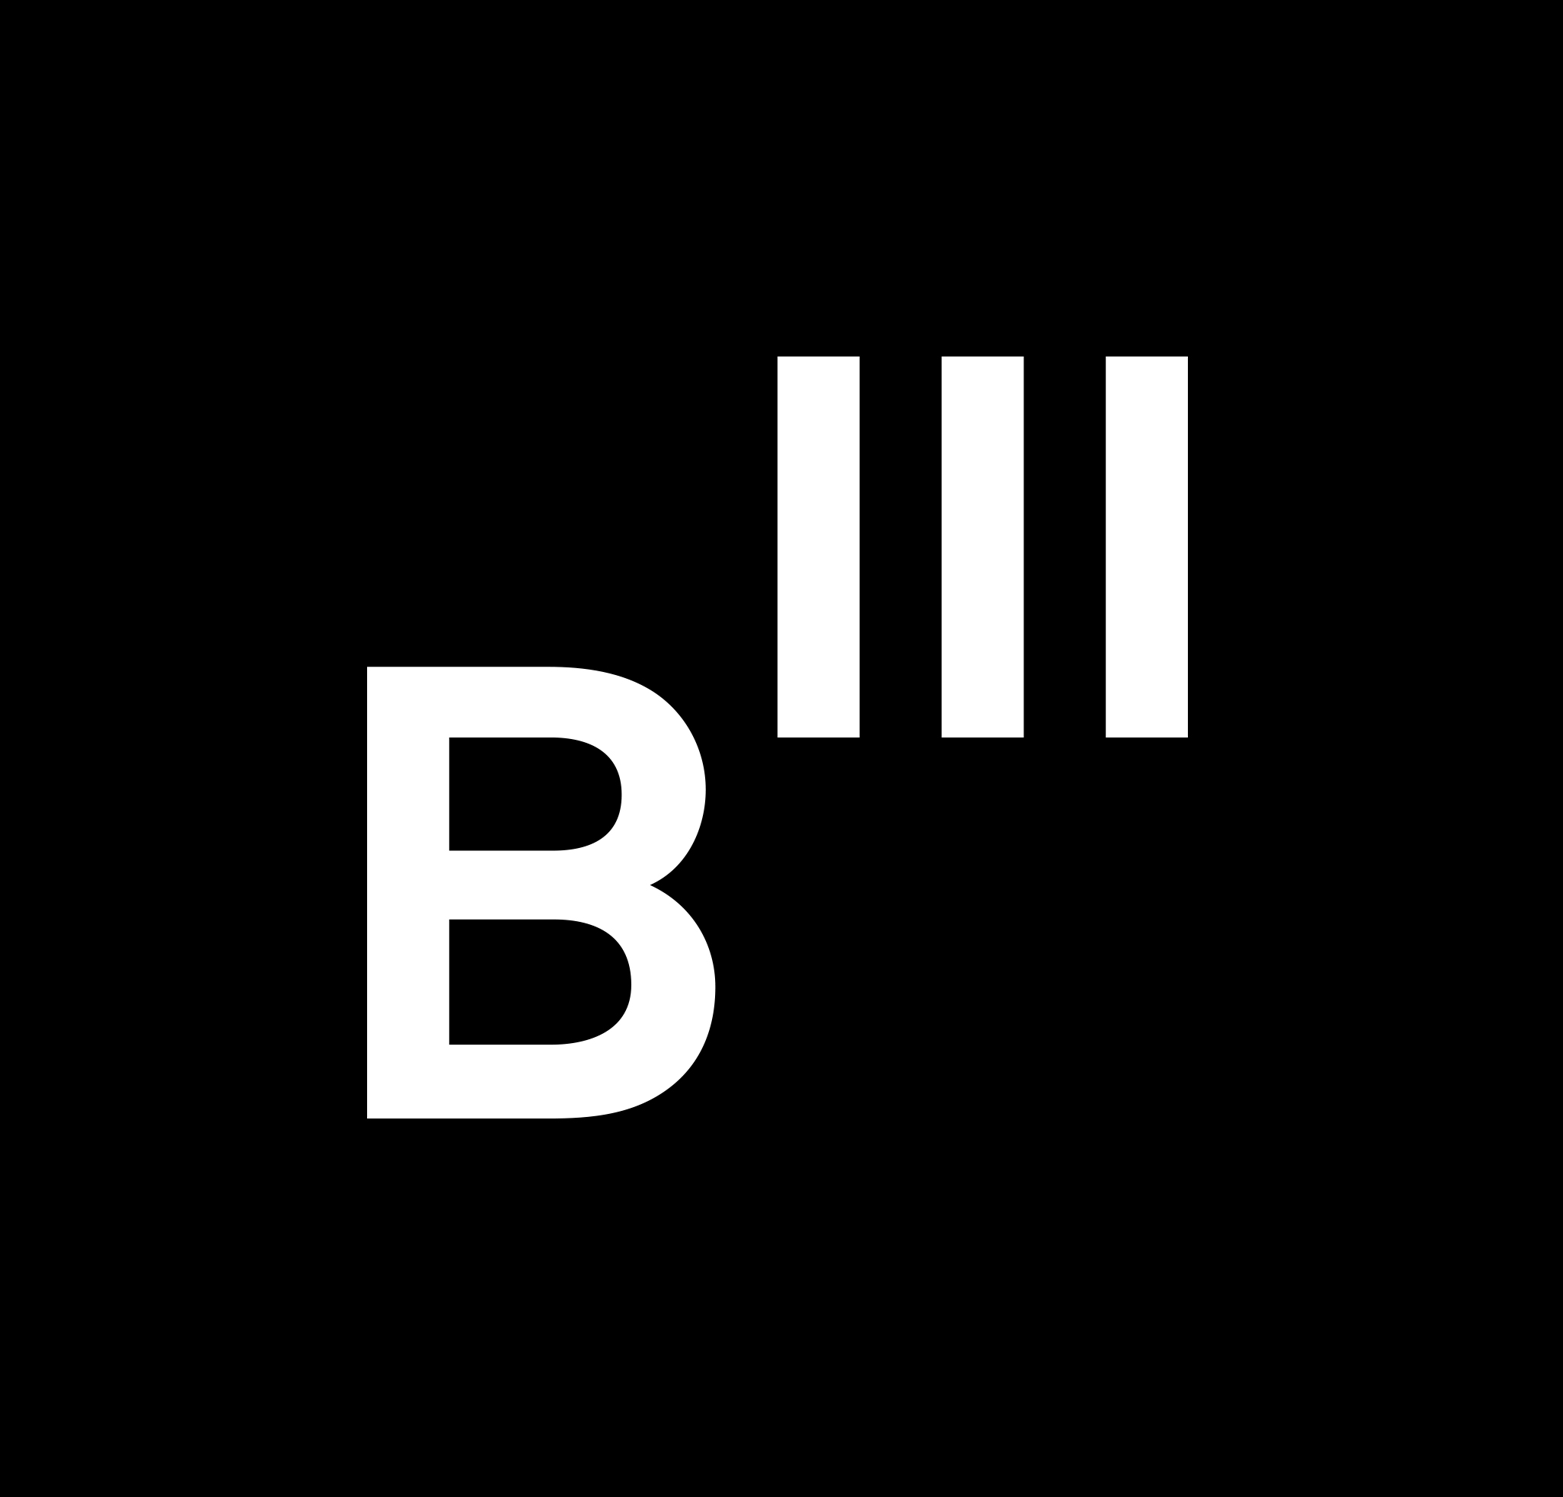 b3-logo-schwarz‑1